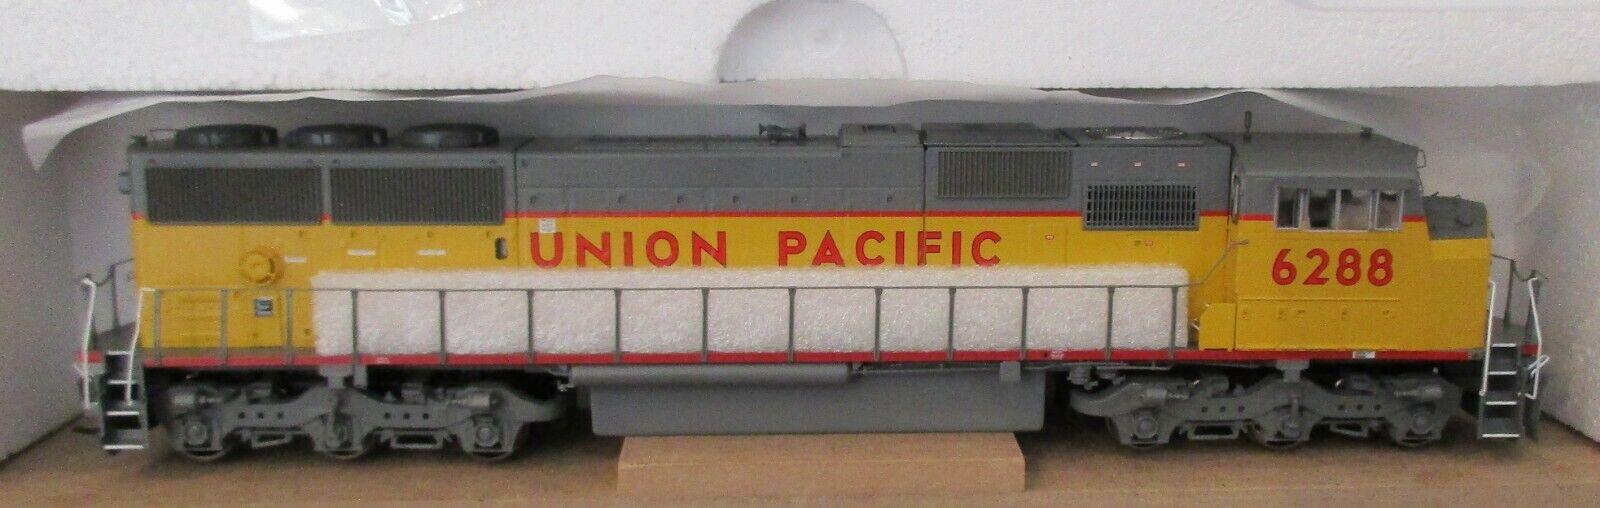 auténtico Escala Ho Athearn Genesis SD60M Union Pacific  6288 6288 6288 - DCC sonido-G67395  garantía de crédito